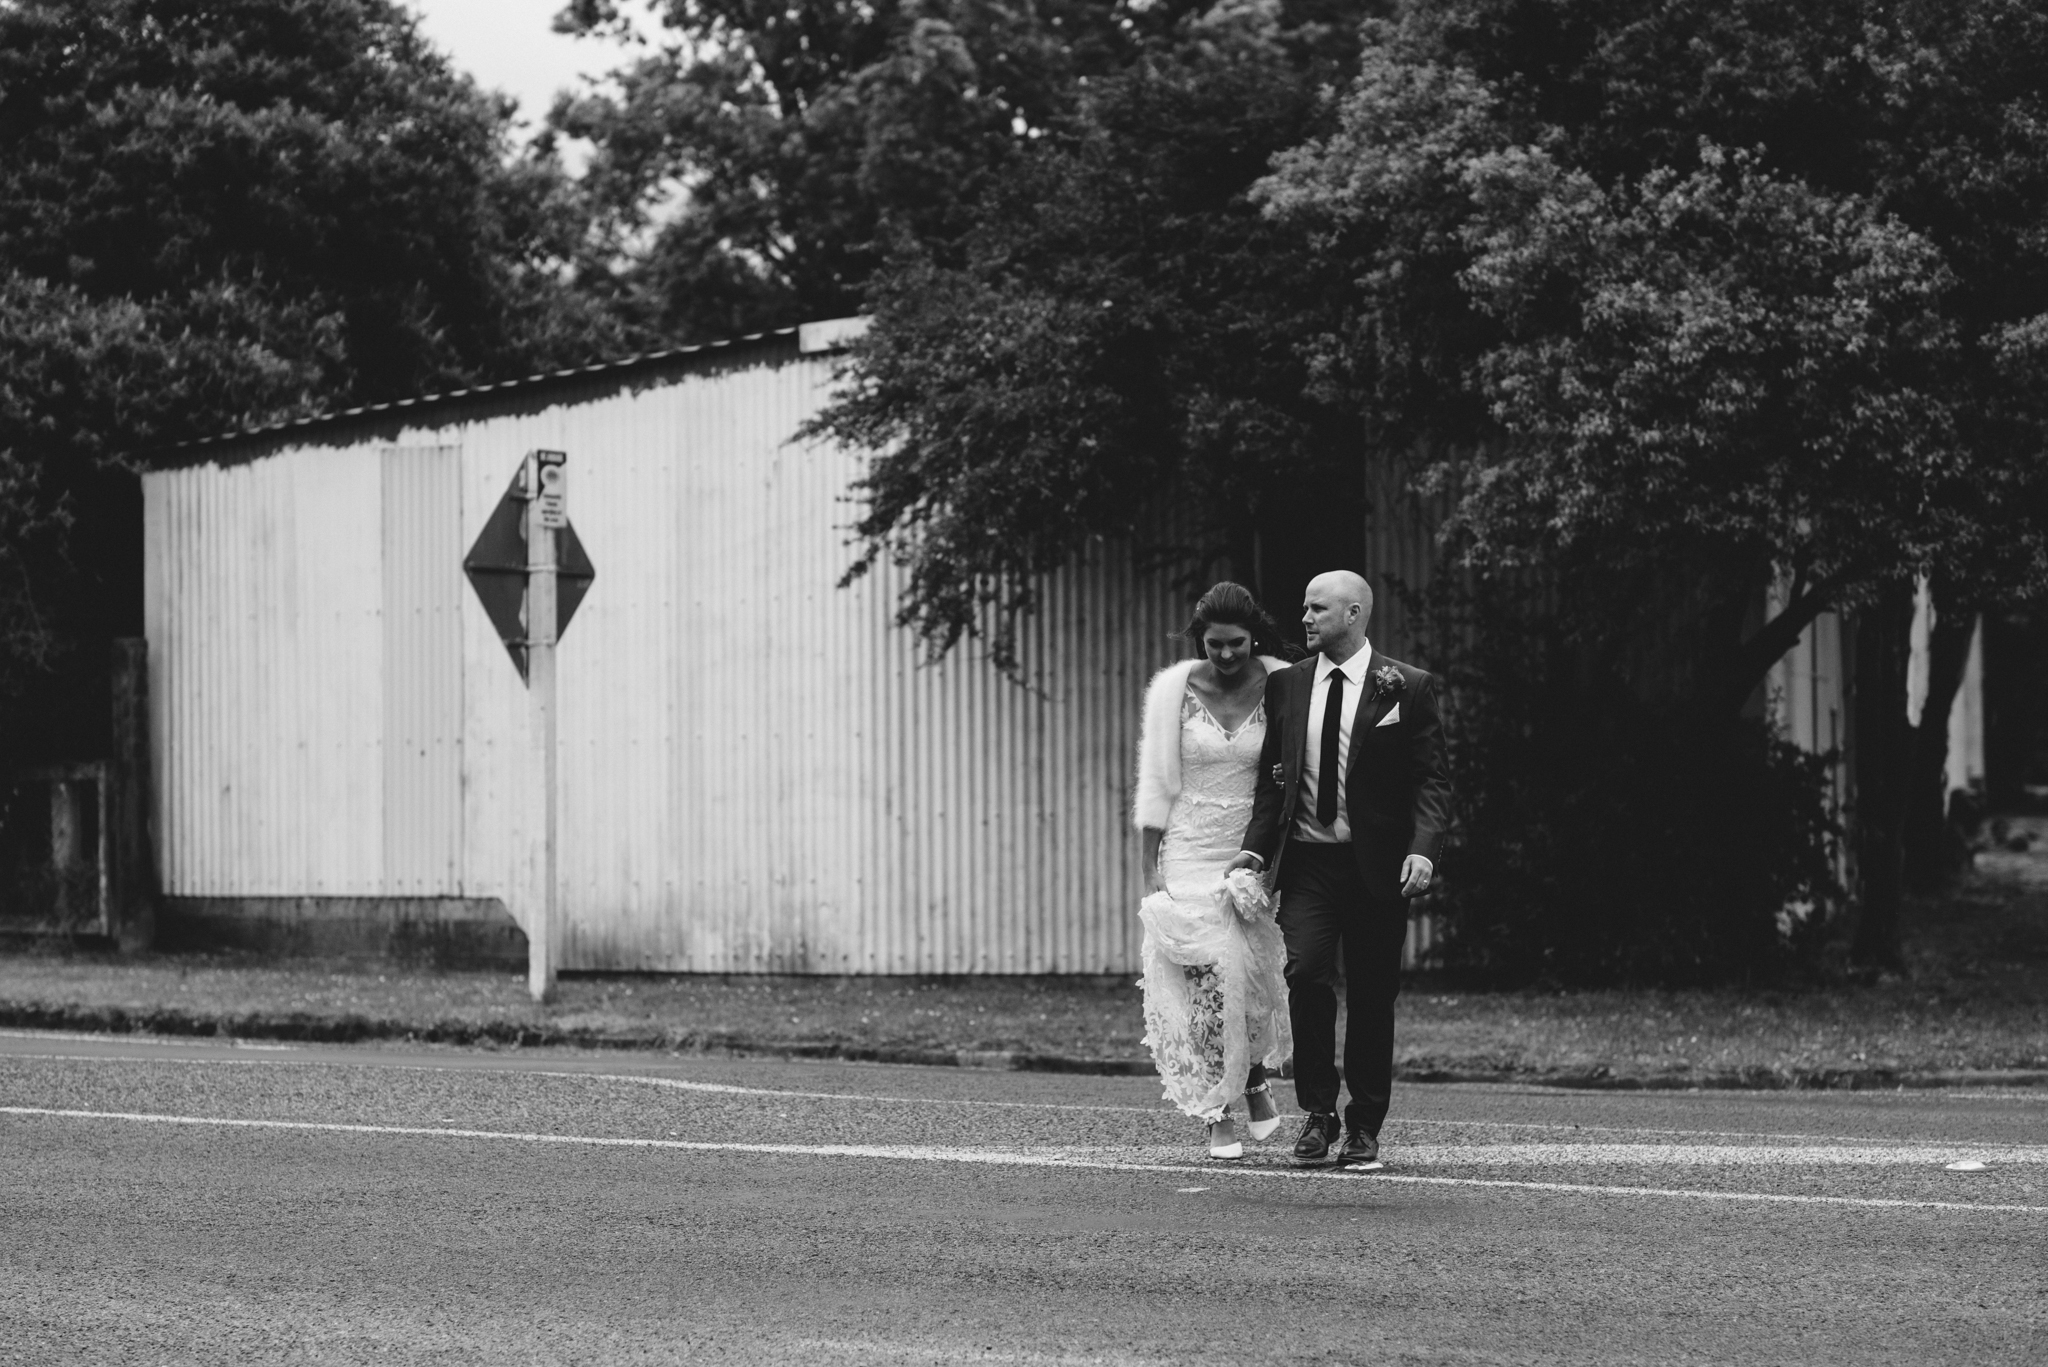 LOVELENSCAPES PHOTOGRAPHY • VISUAL POETRY • NEW ZEALAND WEDDING PHOTOGRAPHER • AUSTRALIAN WEDDING PHOTOGRAPHER • BRISBANE • MELBOURNE • SYDNEY • HOBART • TARUREKA ESTATE • ANNA CAMPBELL • 154.jpg